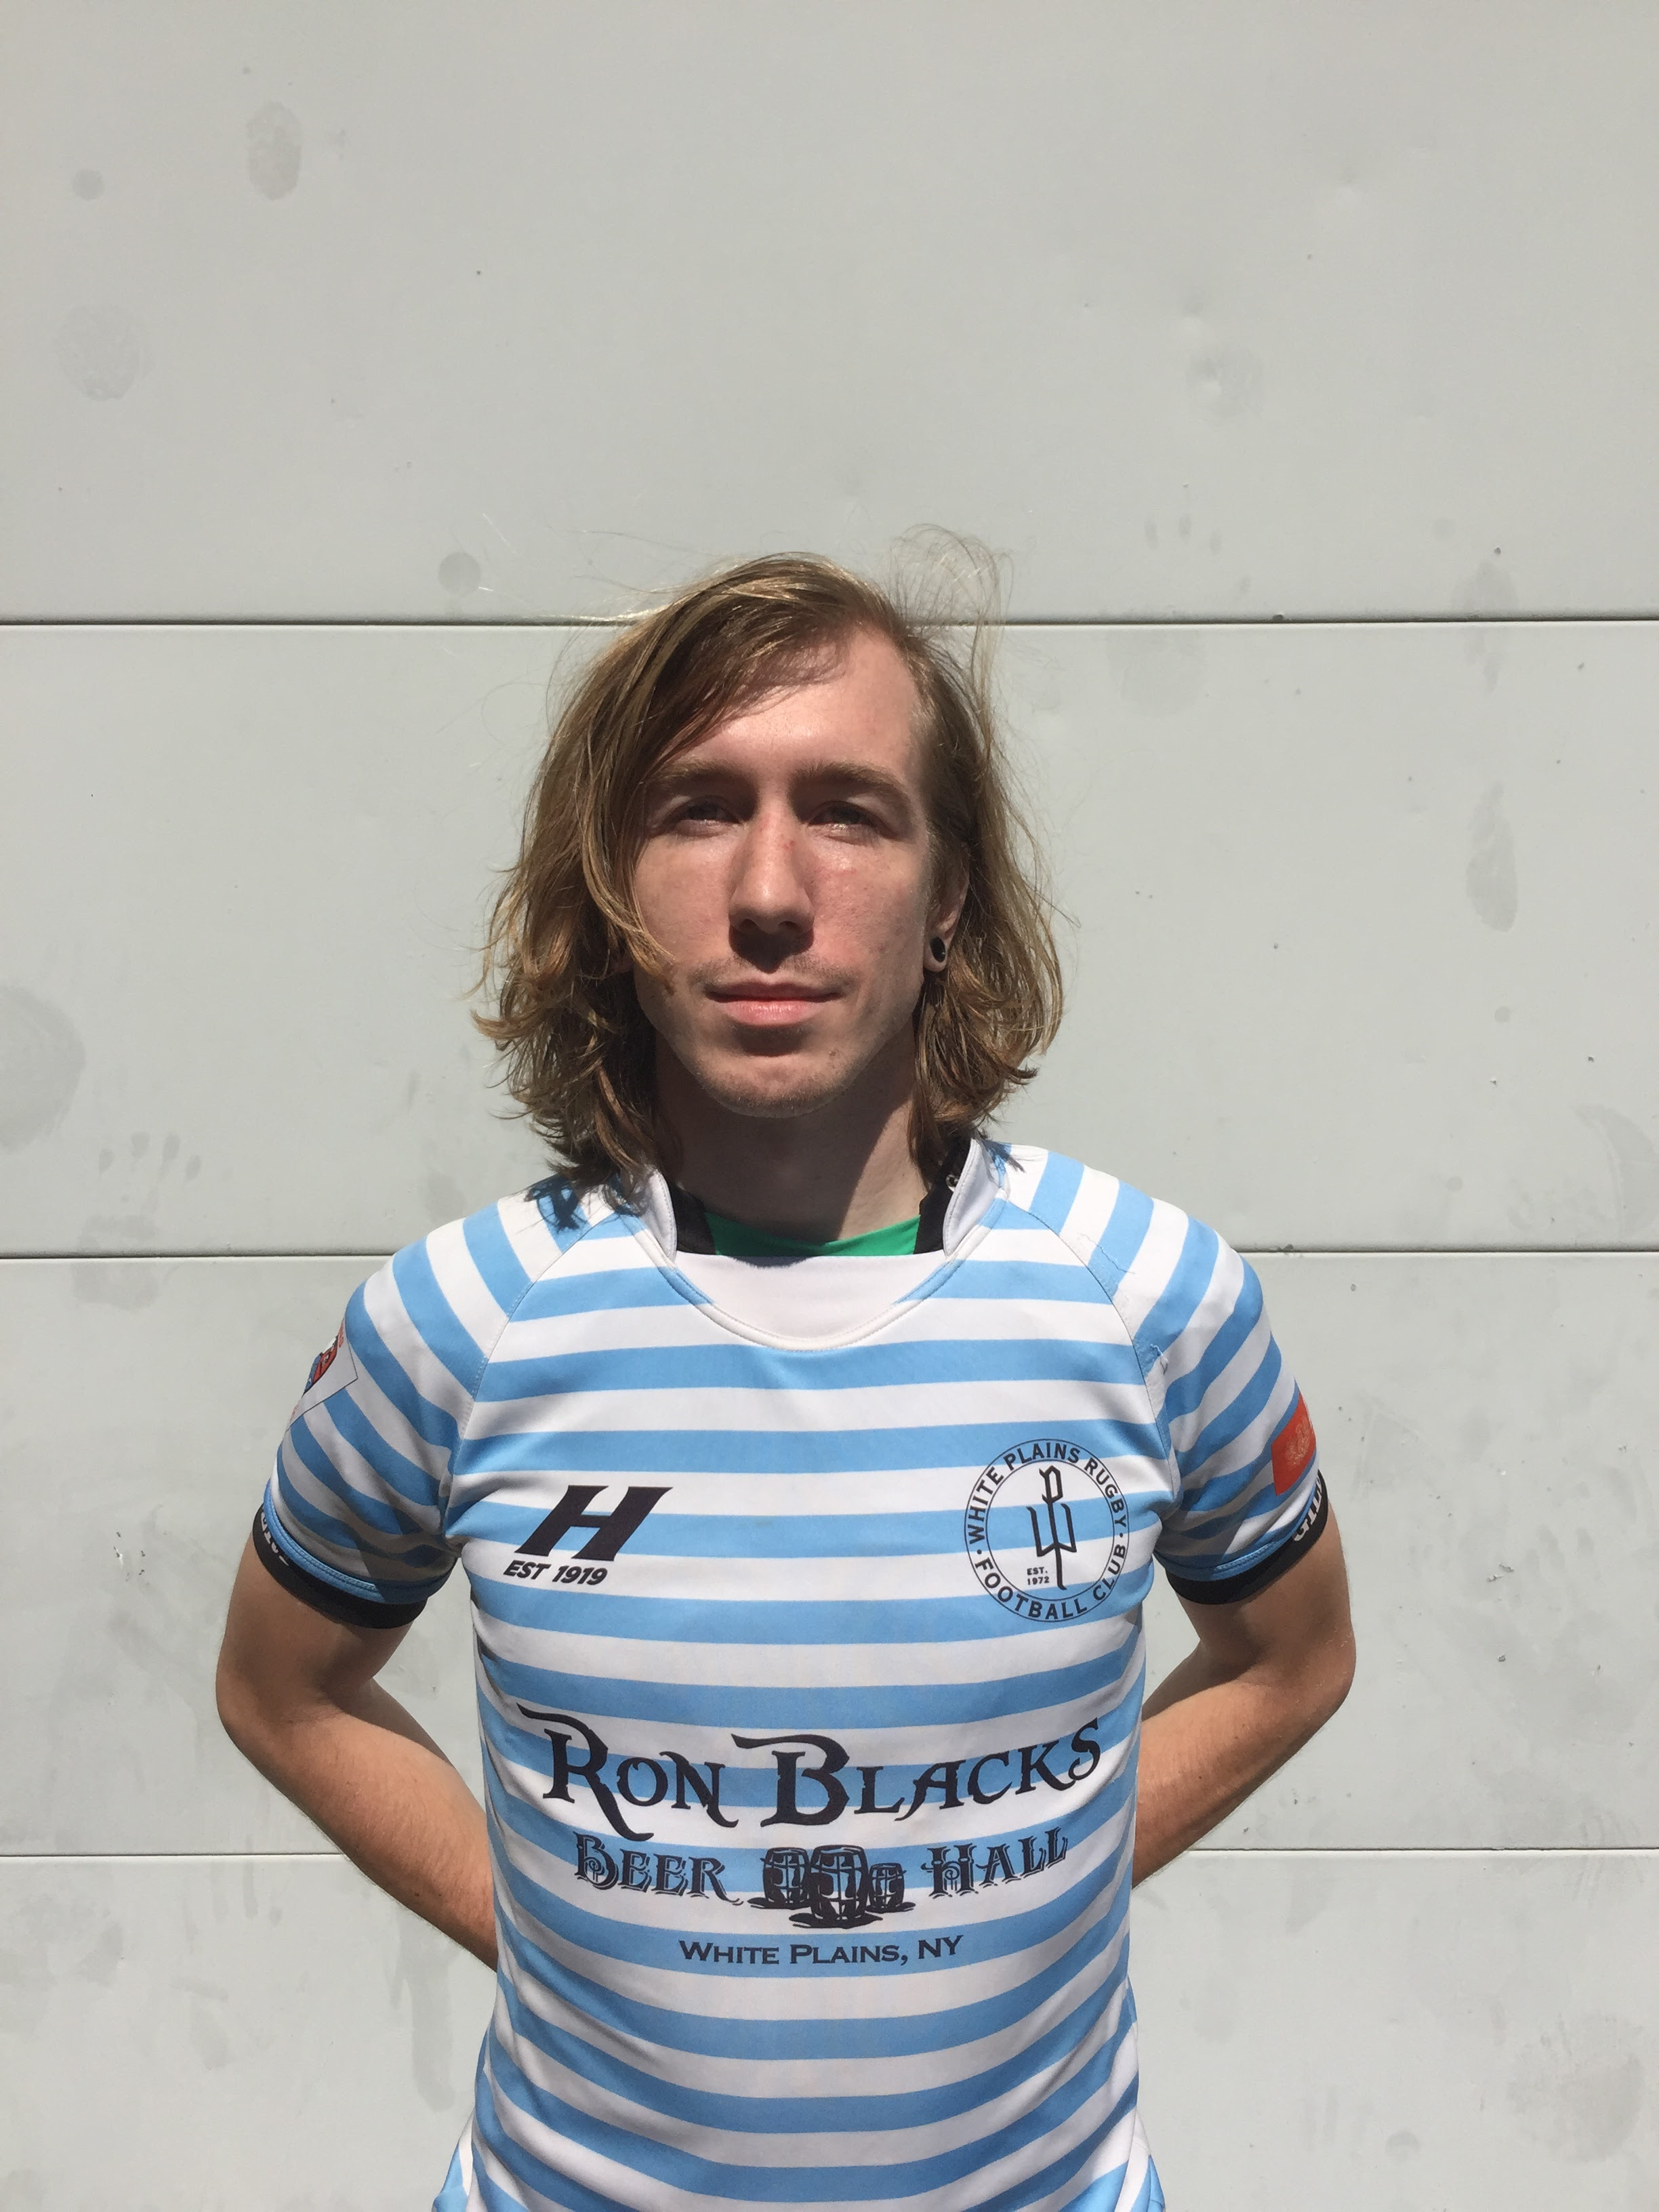 Connor Mccauley